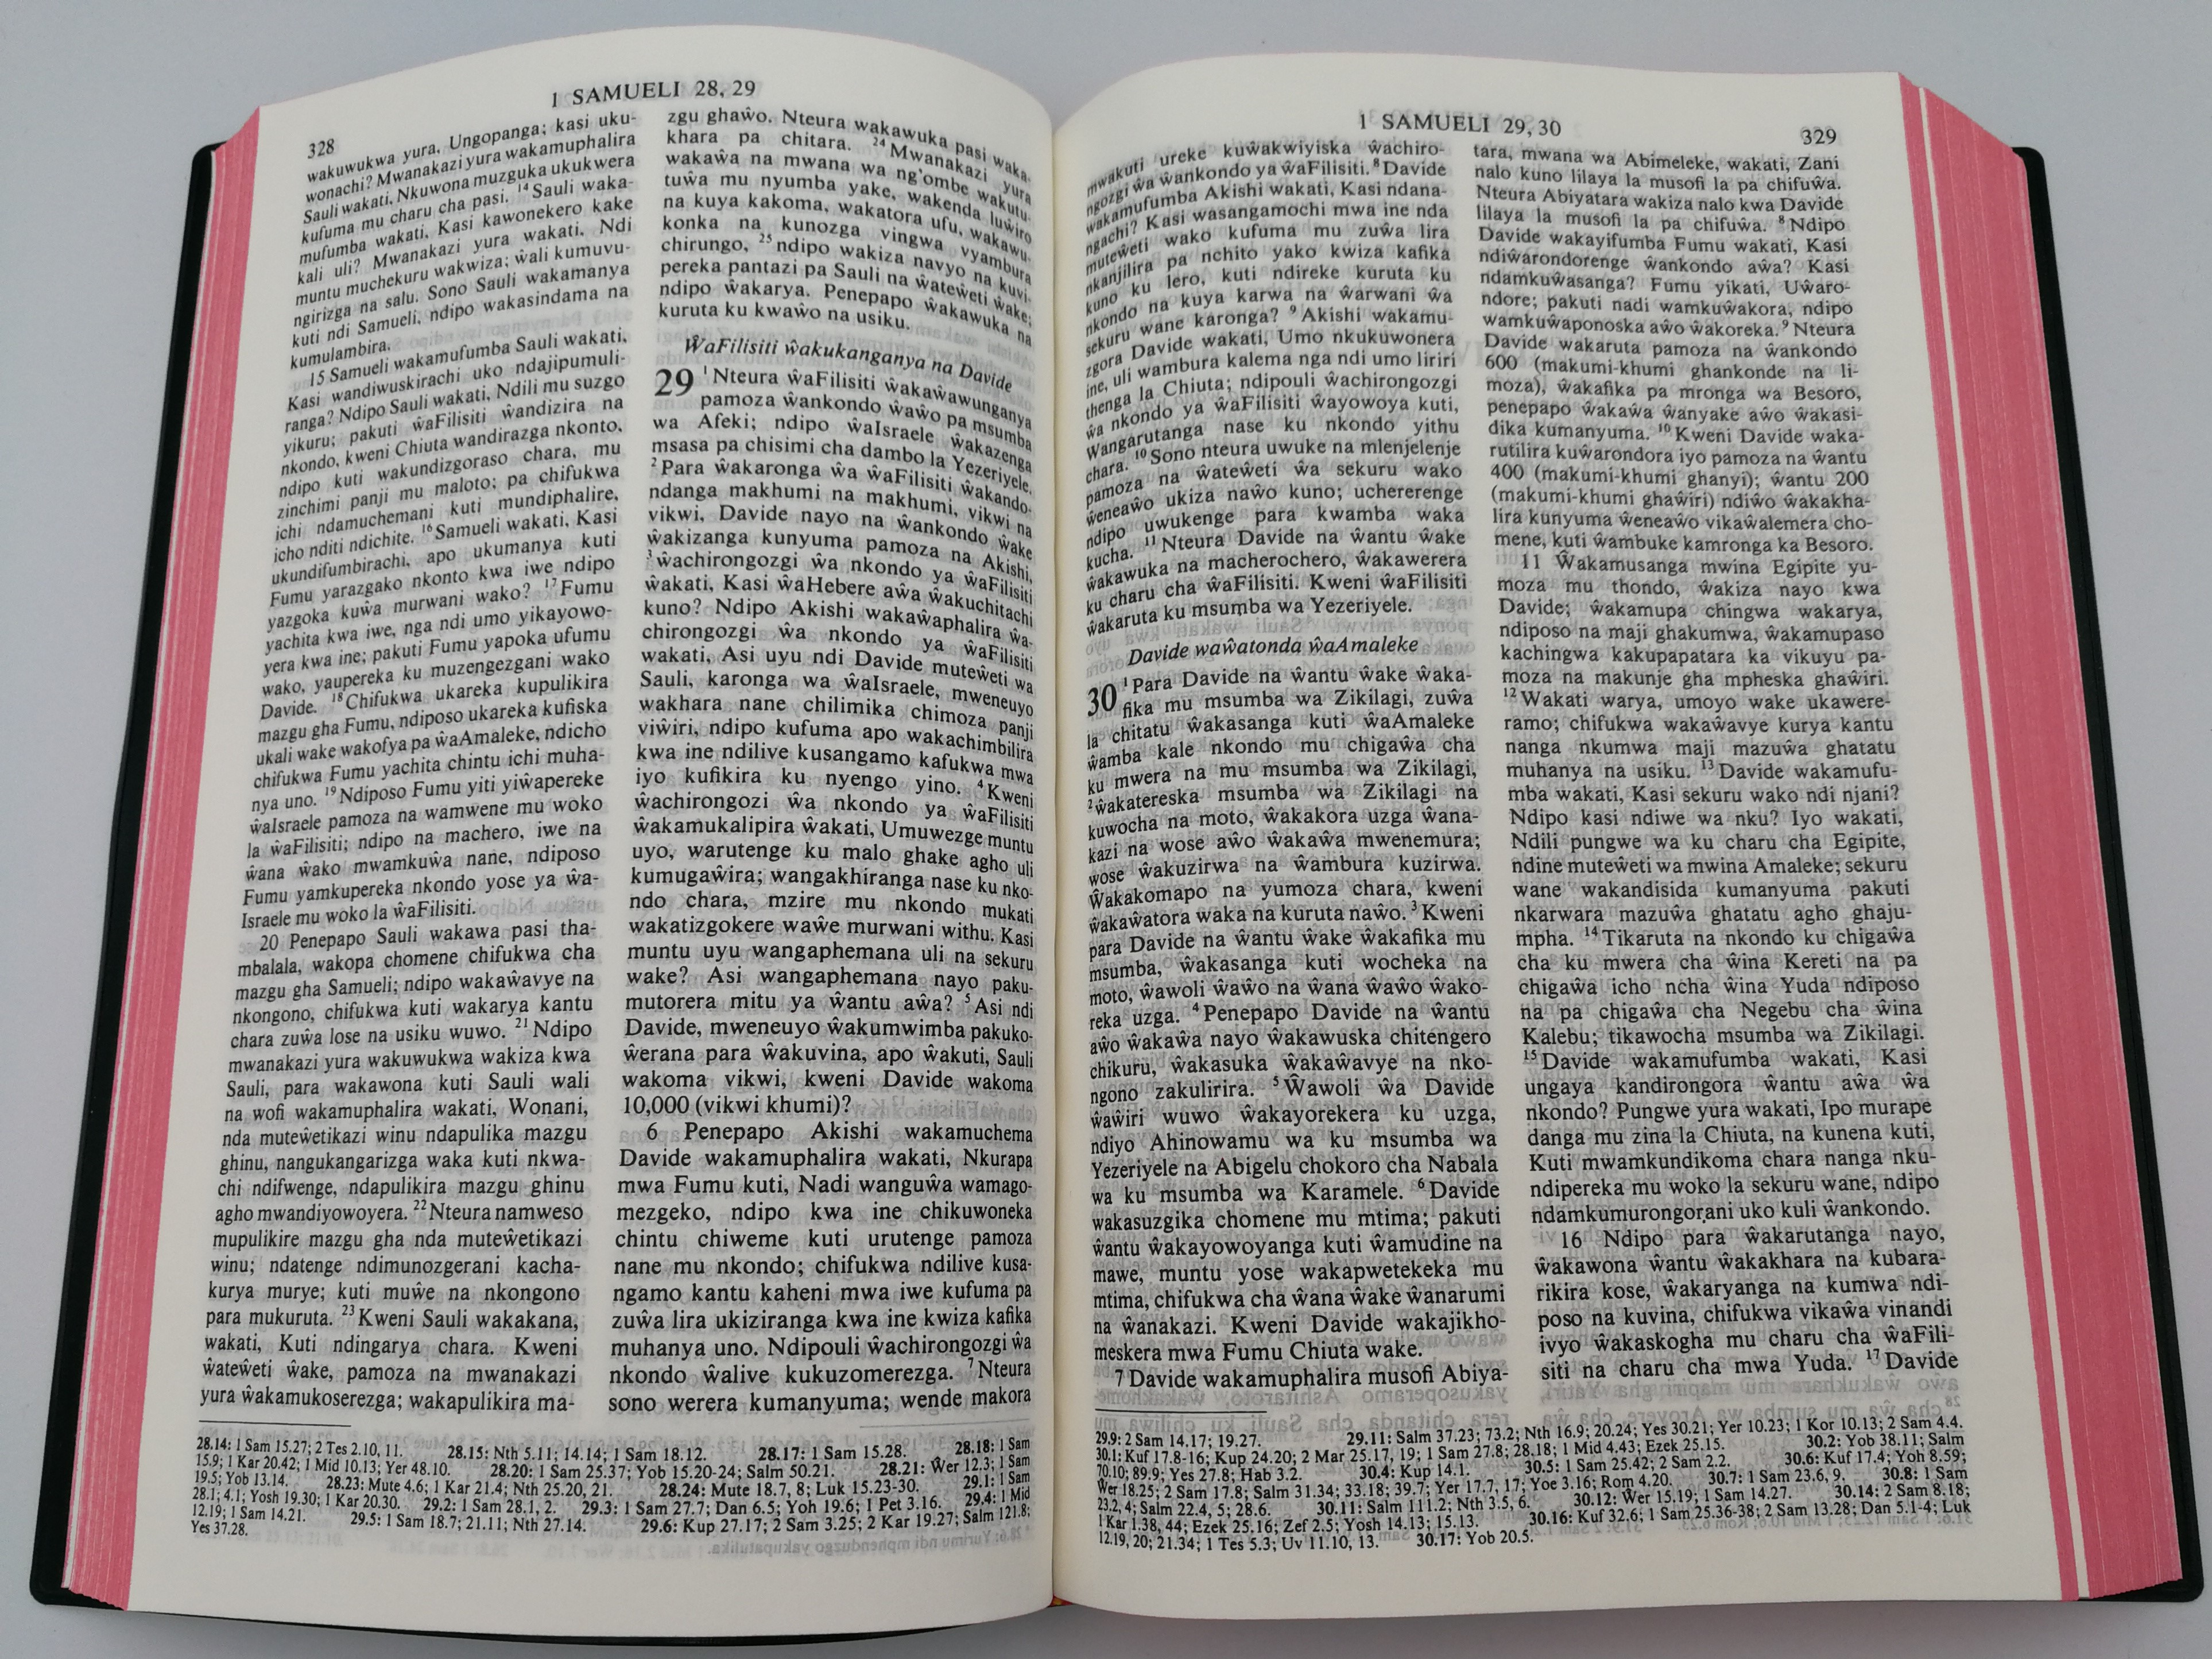 tumbuka-language-holy-bible-mazgu-gha-chiuta-9.jpg